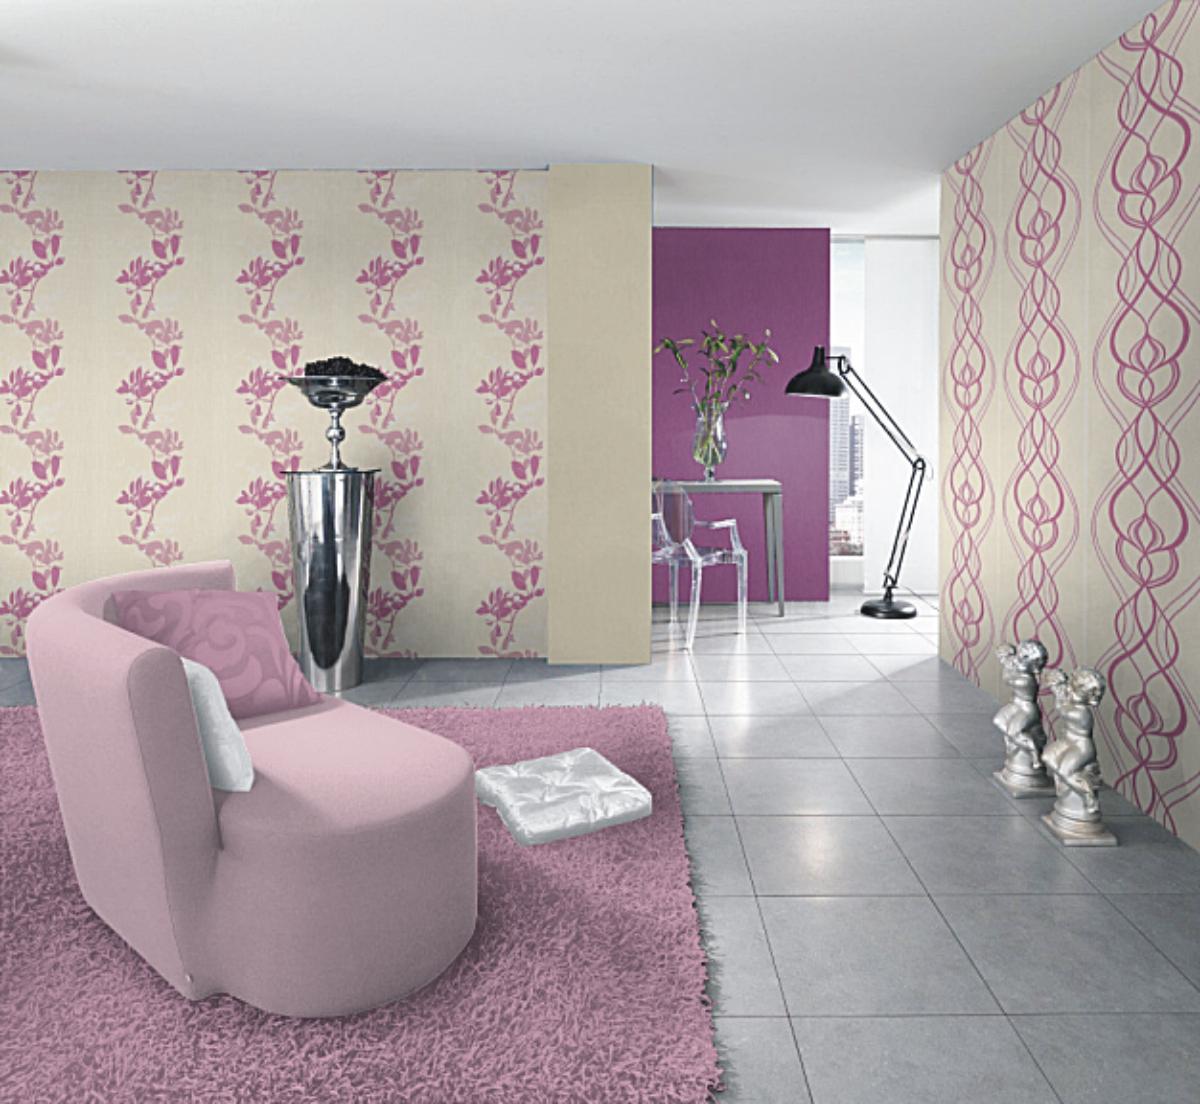 Muster Tapete Um Fenster Kleben : Rasch Tapeten Emocion 2013 – 776287 Tapete Neu Retro Barock Creme lila